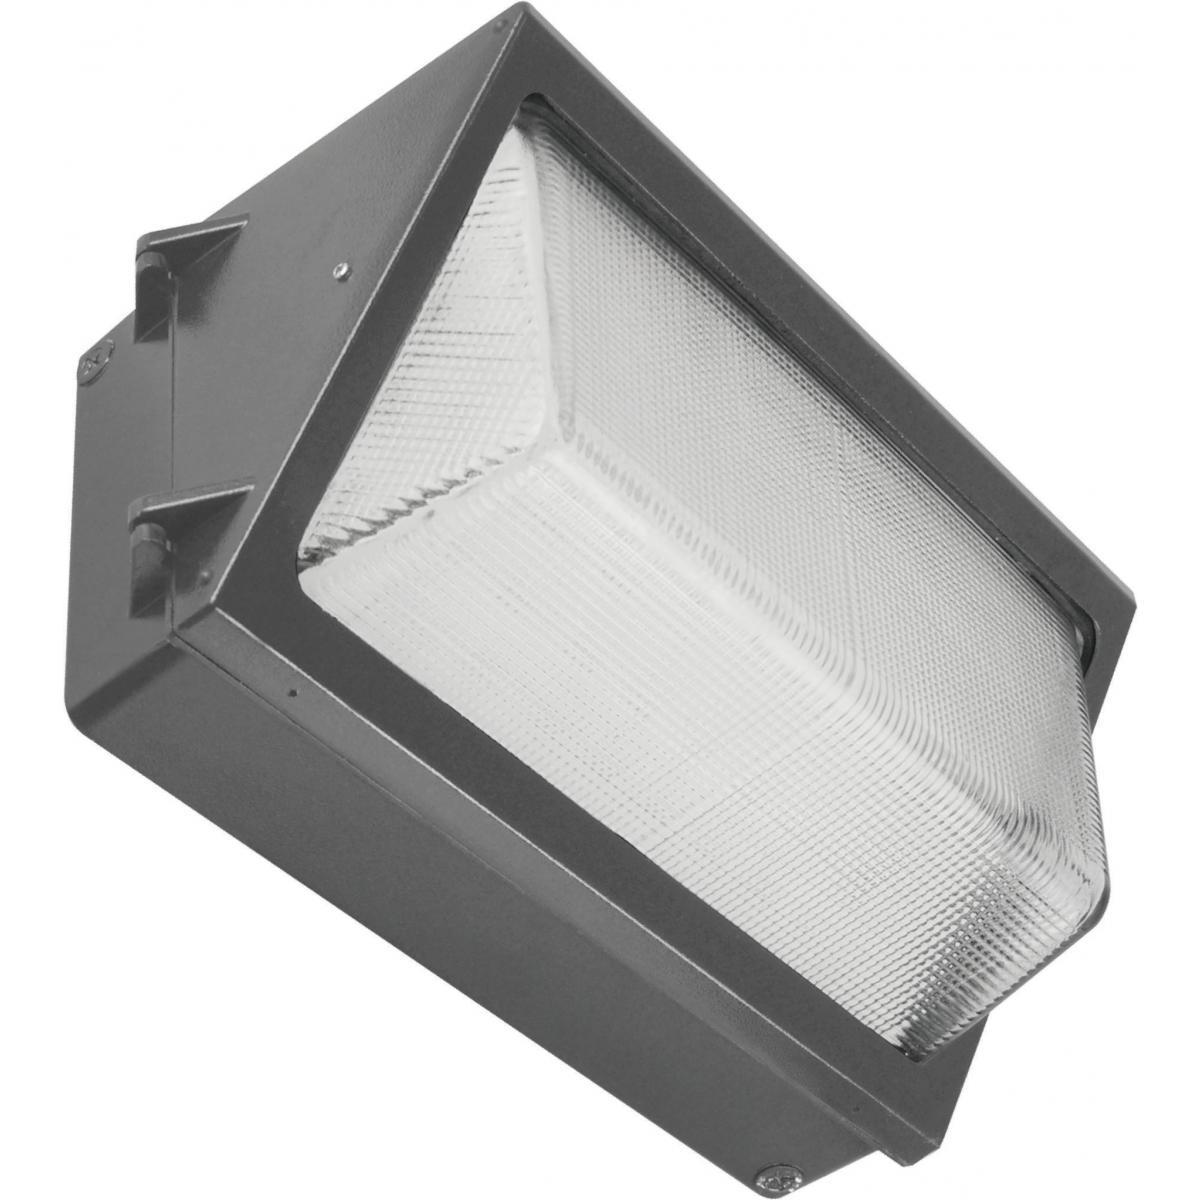 65-236 LED WALL PACK 95 WATT/5000K